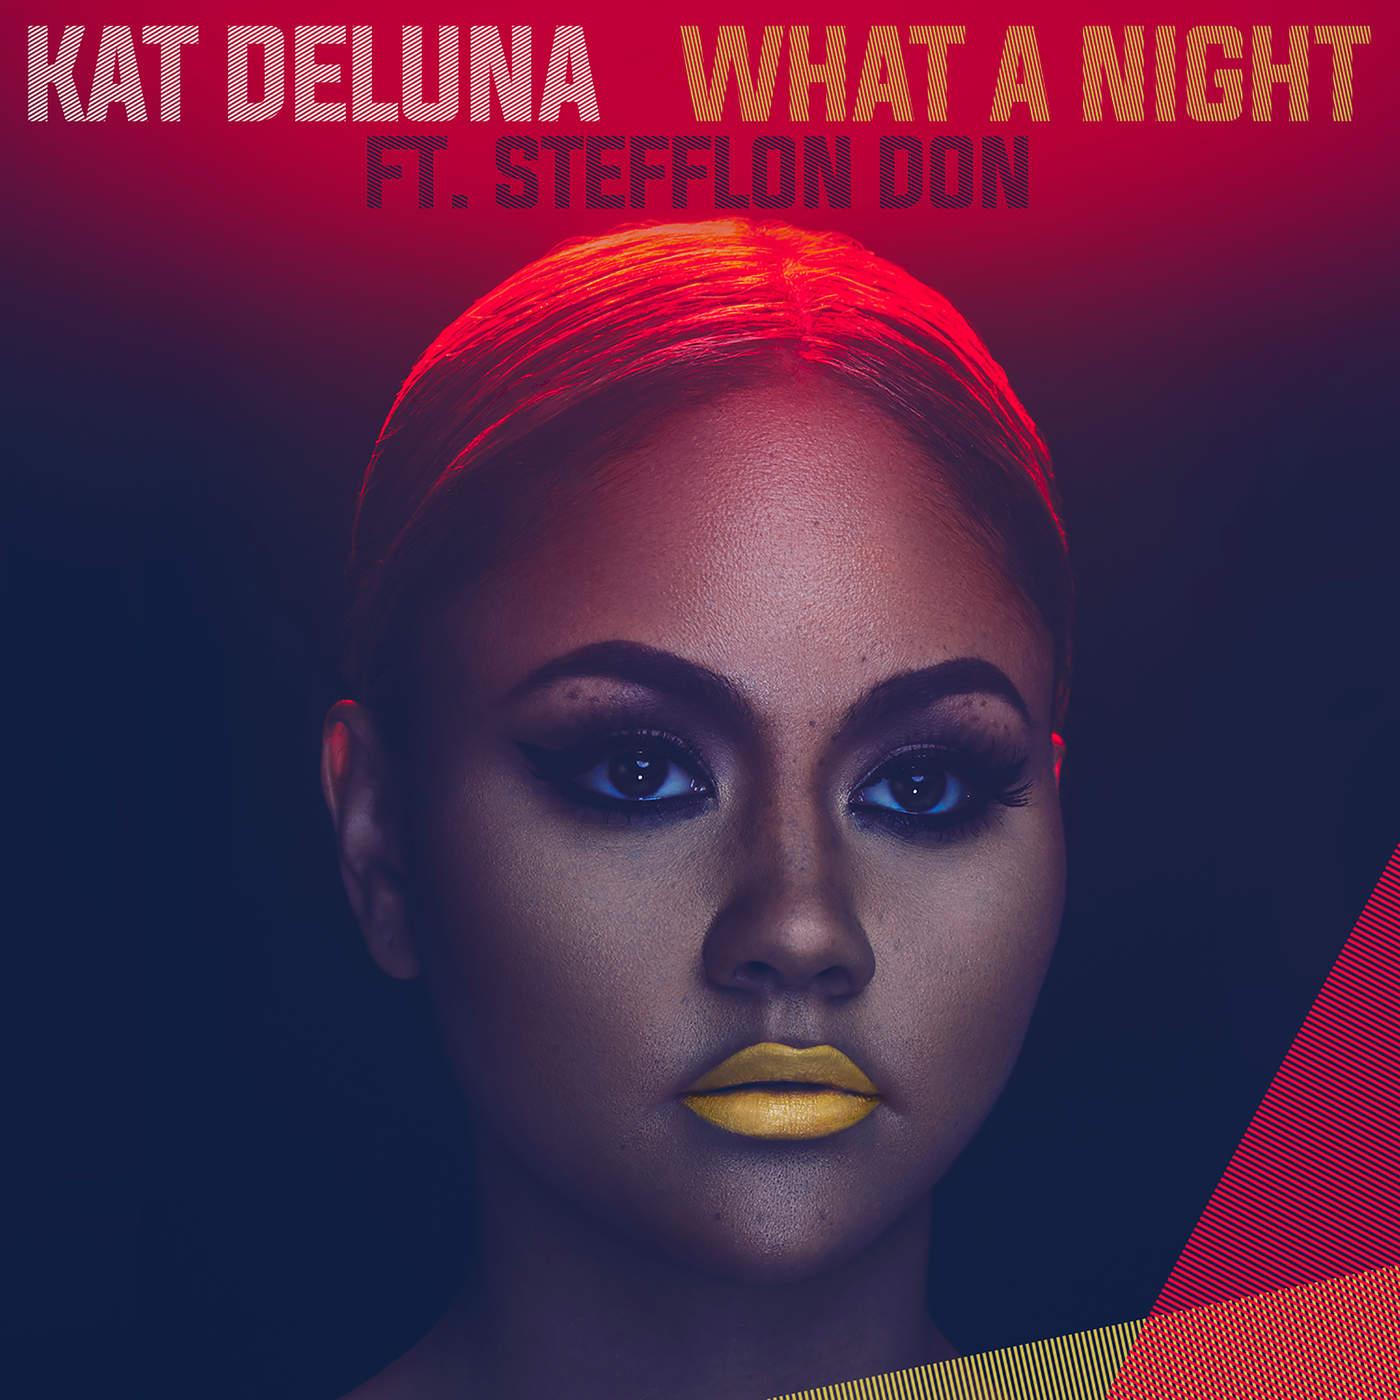 Kat DeLuna - What a Night (feat. Jeremih & Stefflon Don) [Remix] - Single Cover